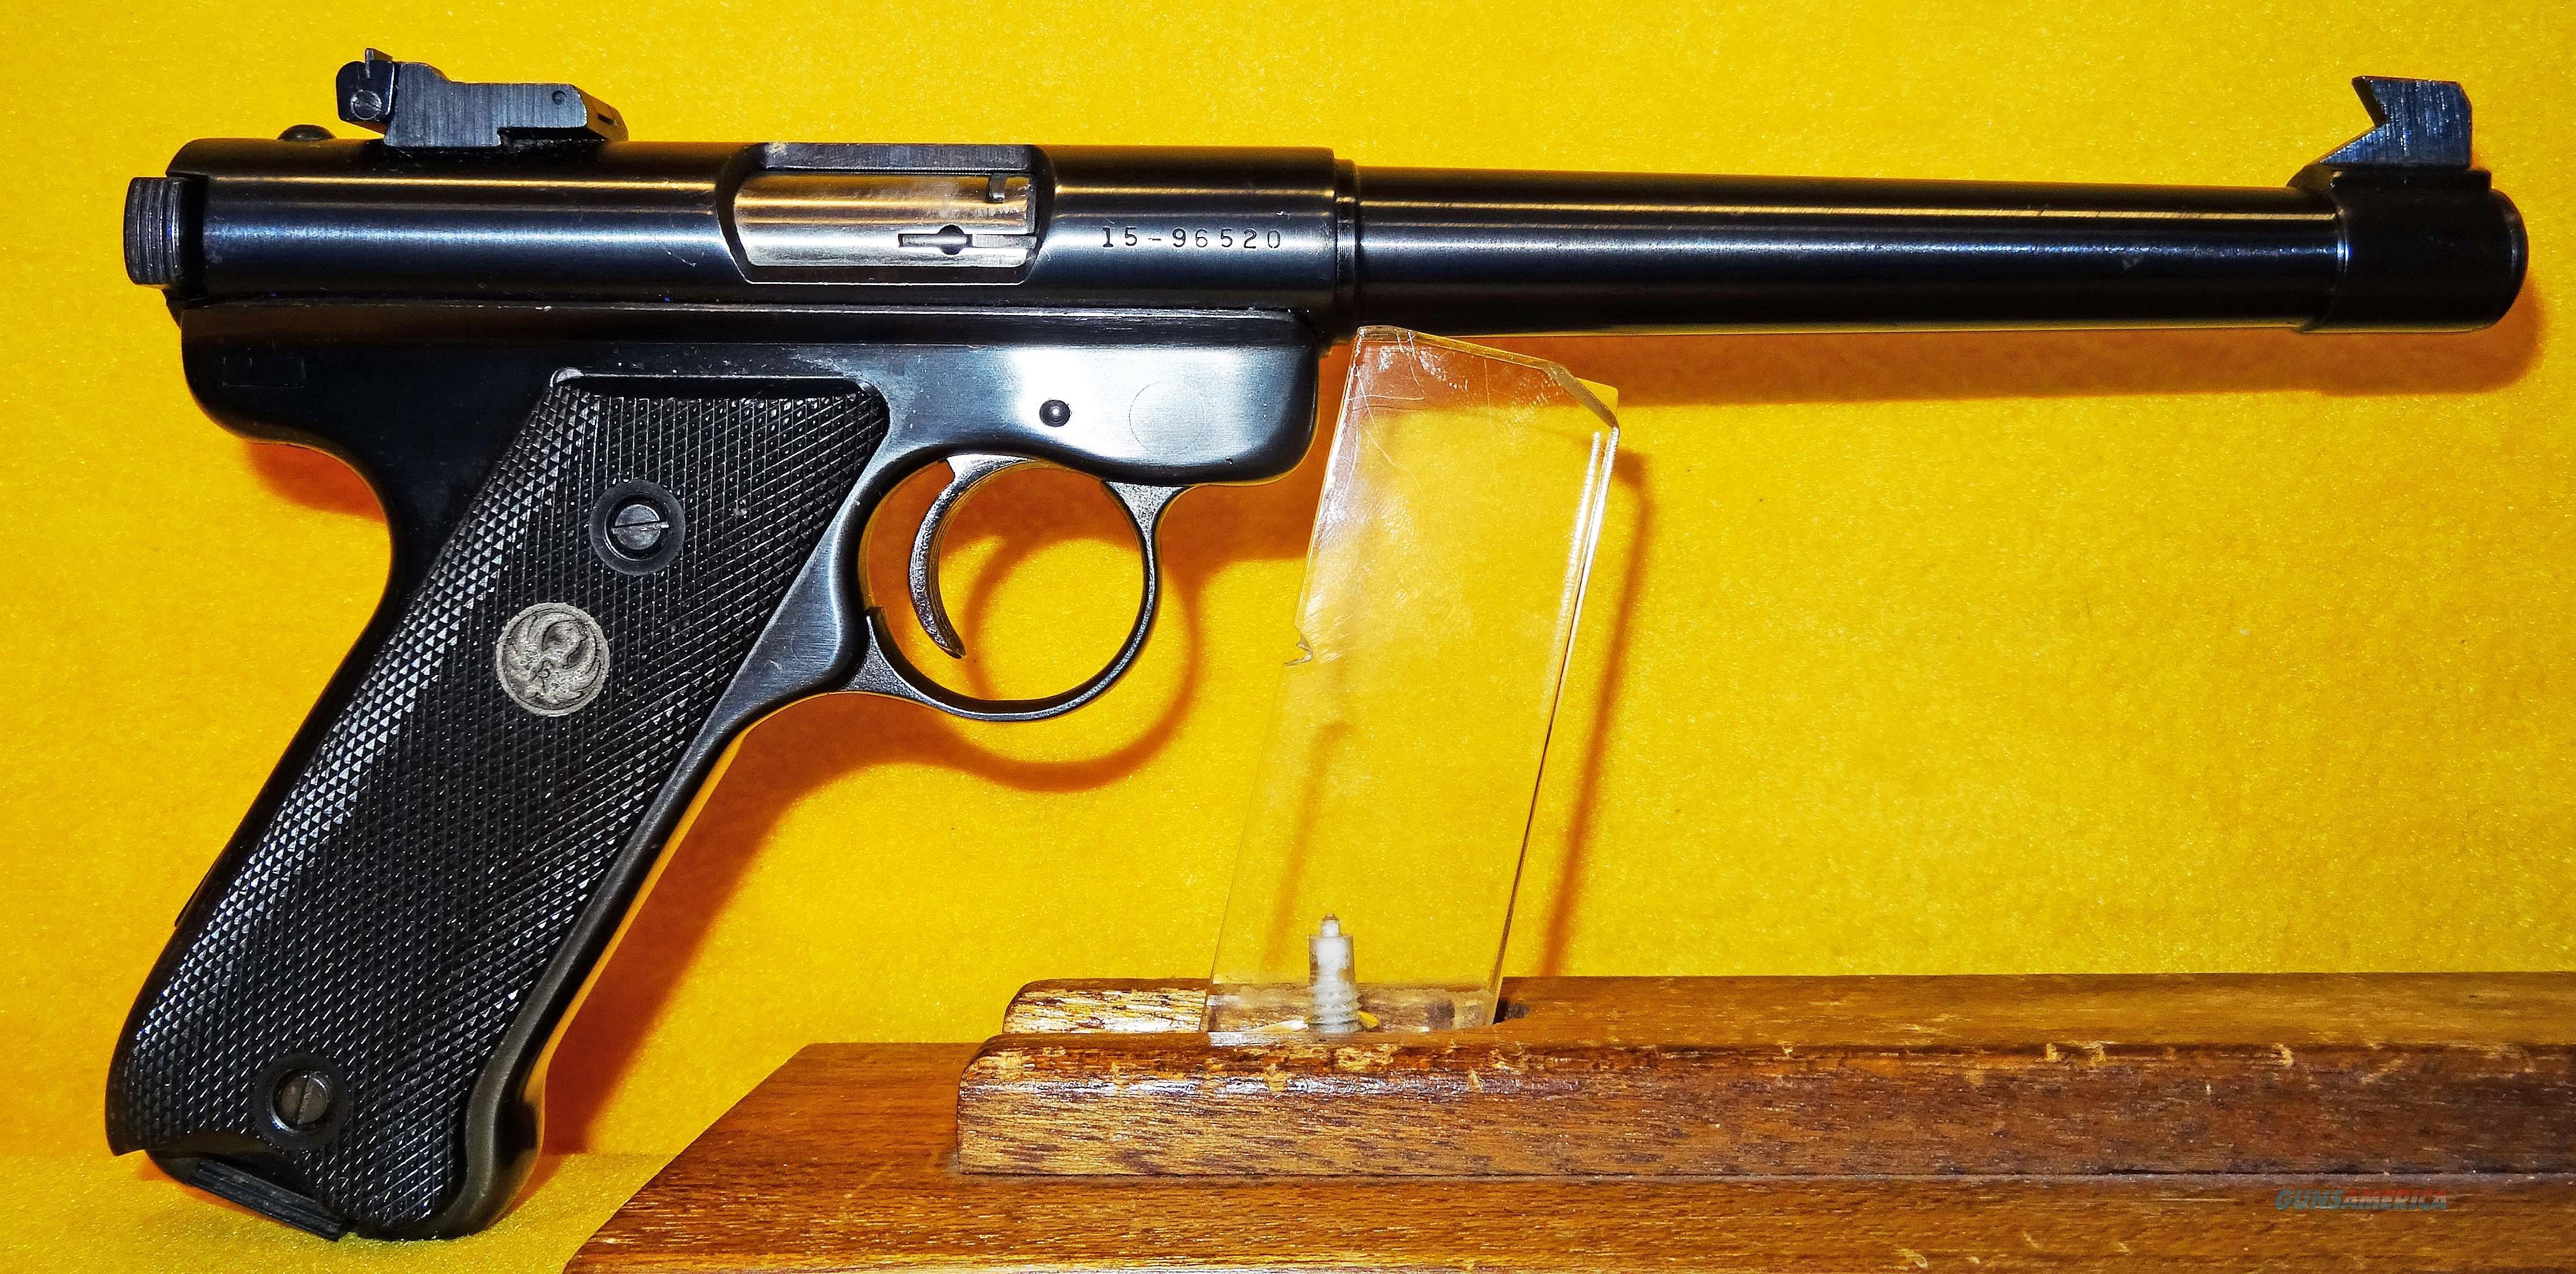 RUGER MKI TARGET  Guns > Pistols > Ruger Semi-Auto Pistols > Mark I/II/III/IV Family